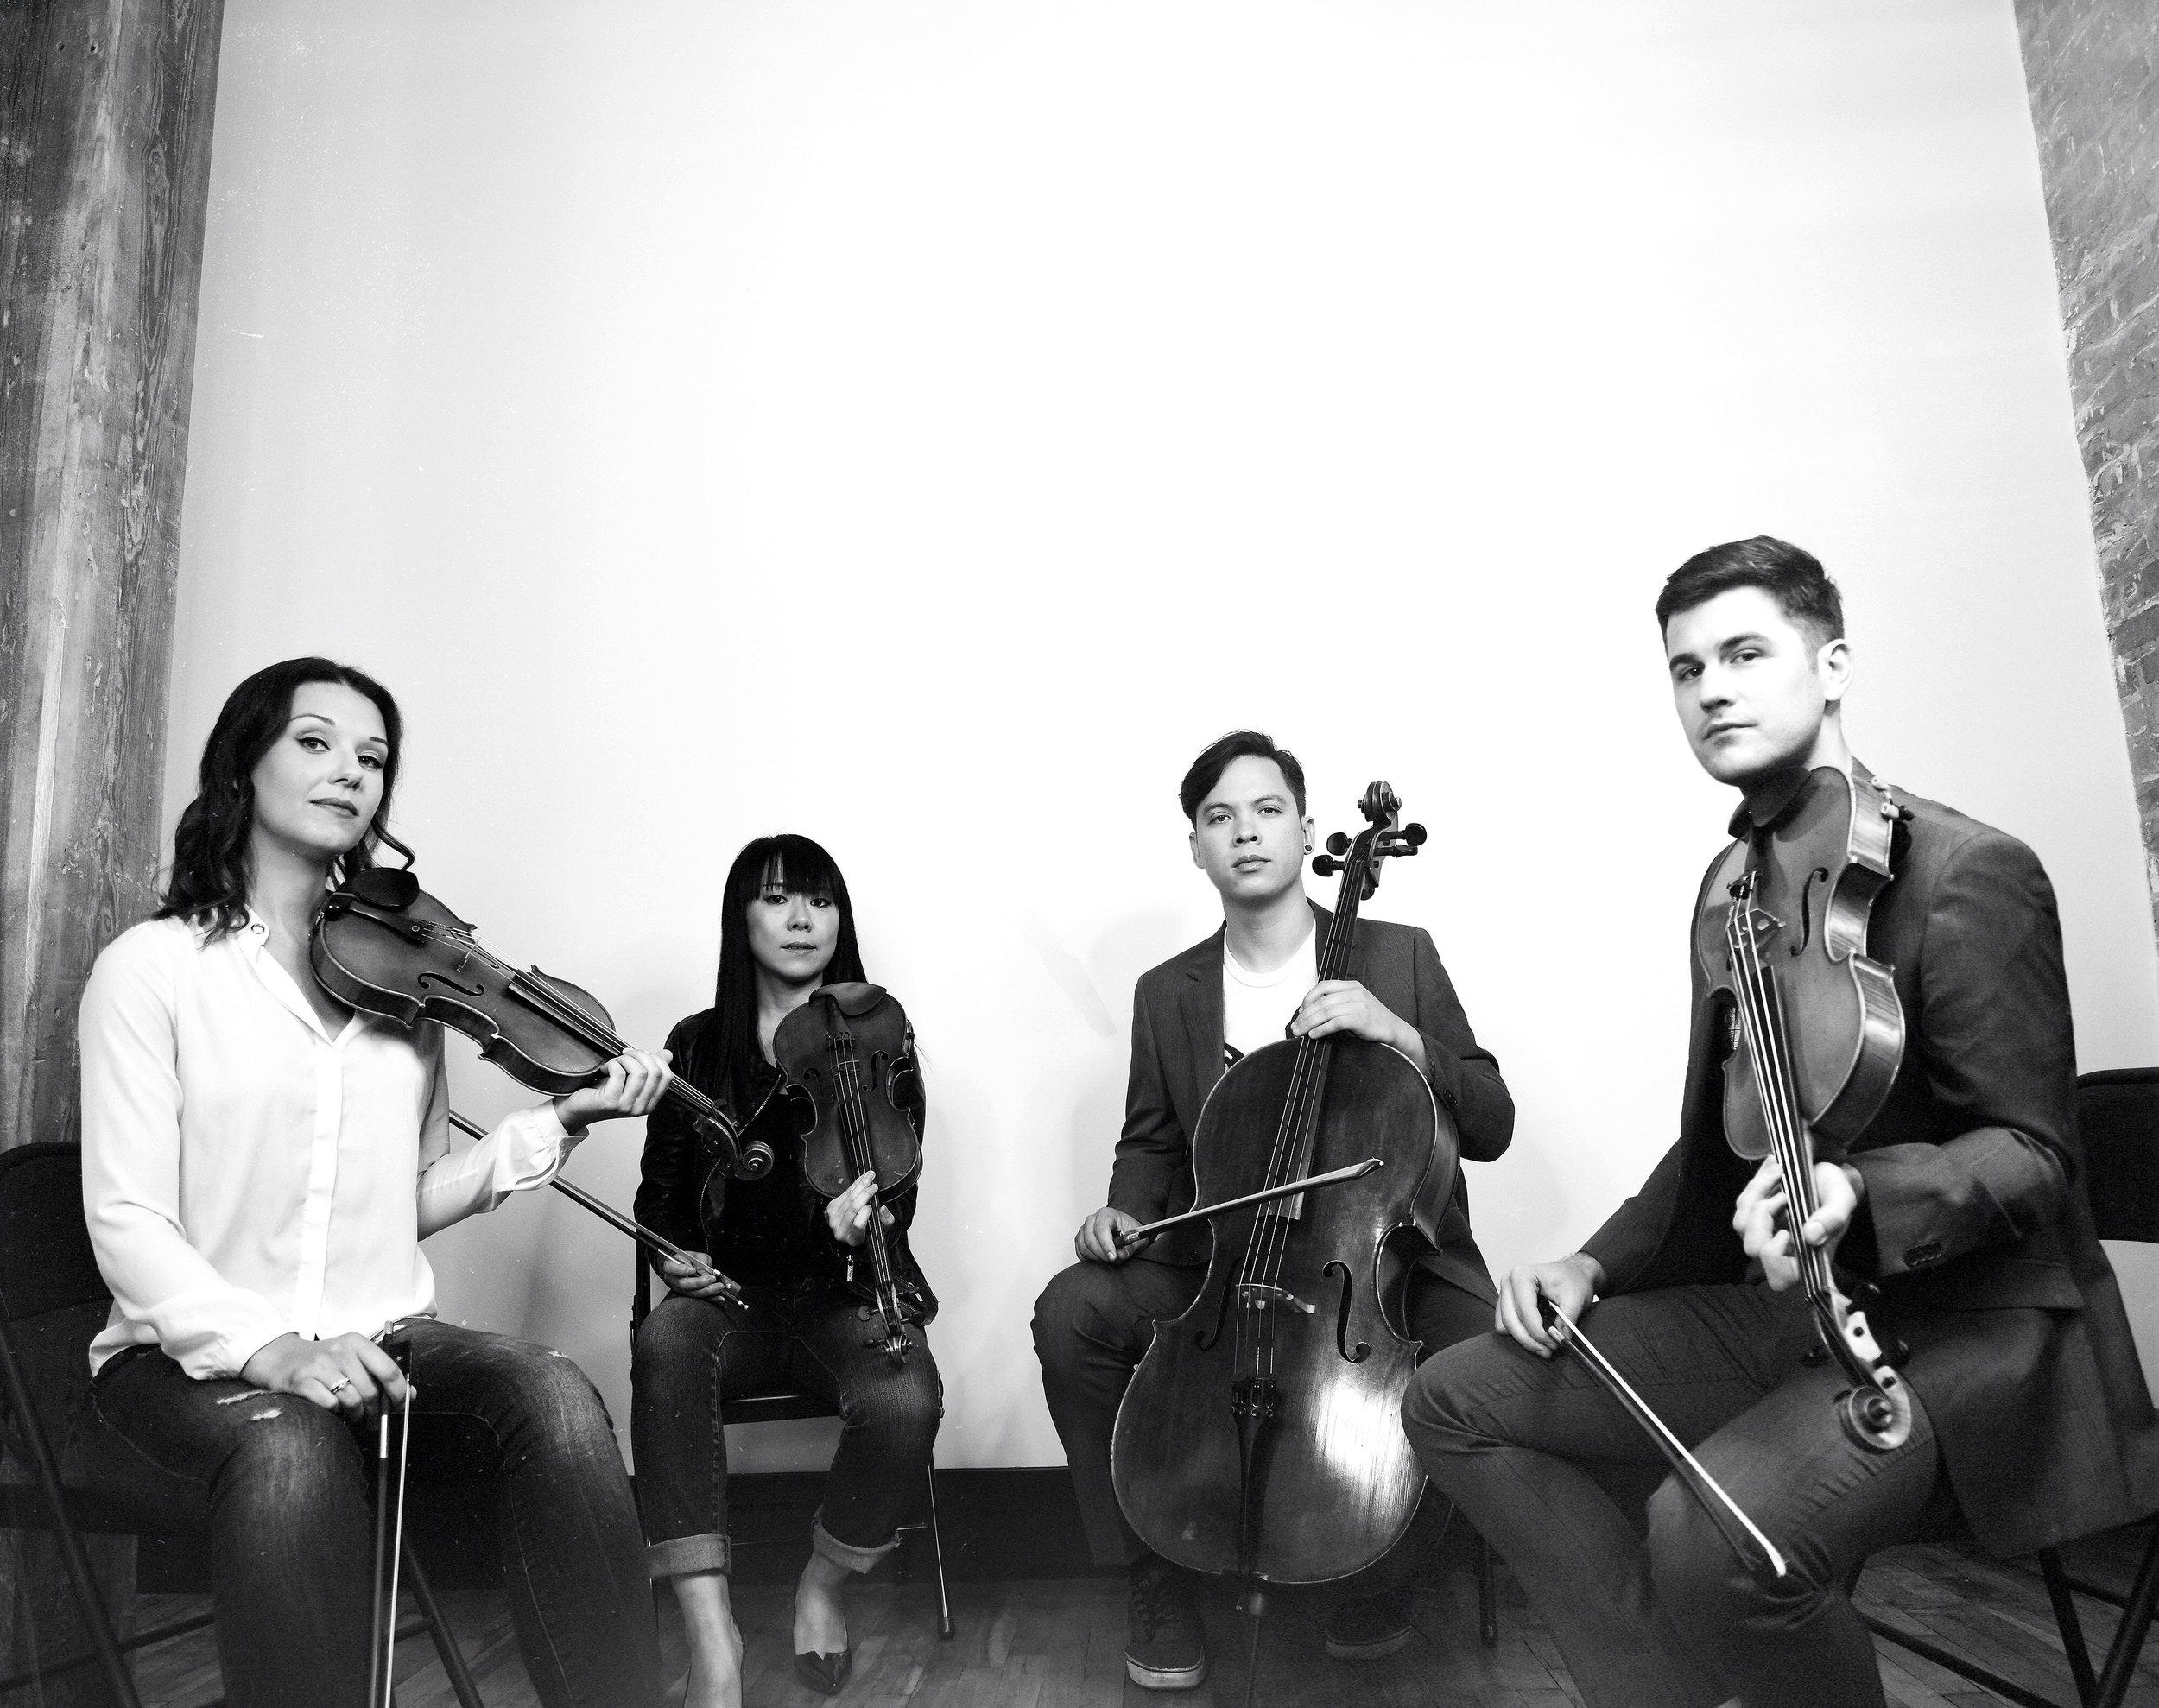 Attacca Quartet (from left): Amy Schroeder and Keiko Tokunaga, violins; Andrew Yee, cello; Nathan Schram, viola. Shervin Lainez photograph